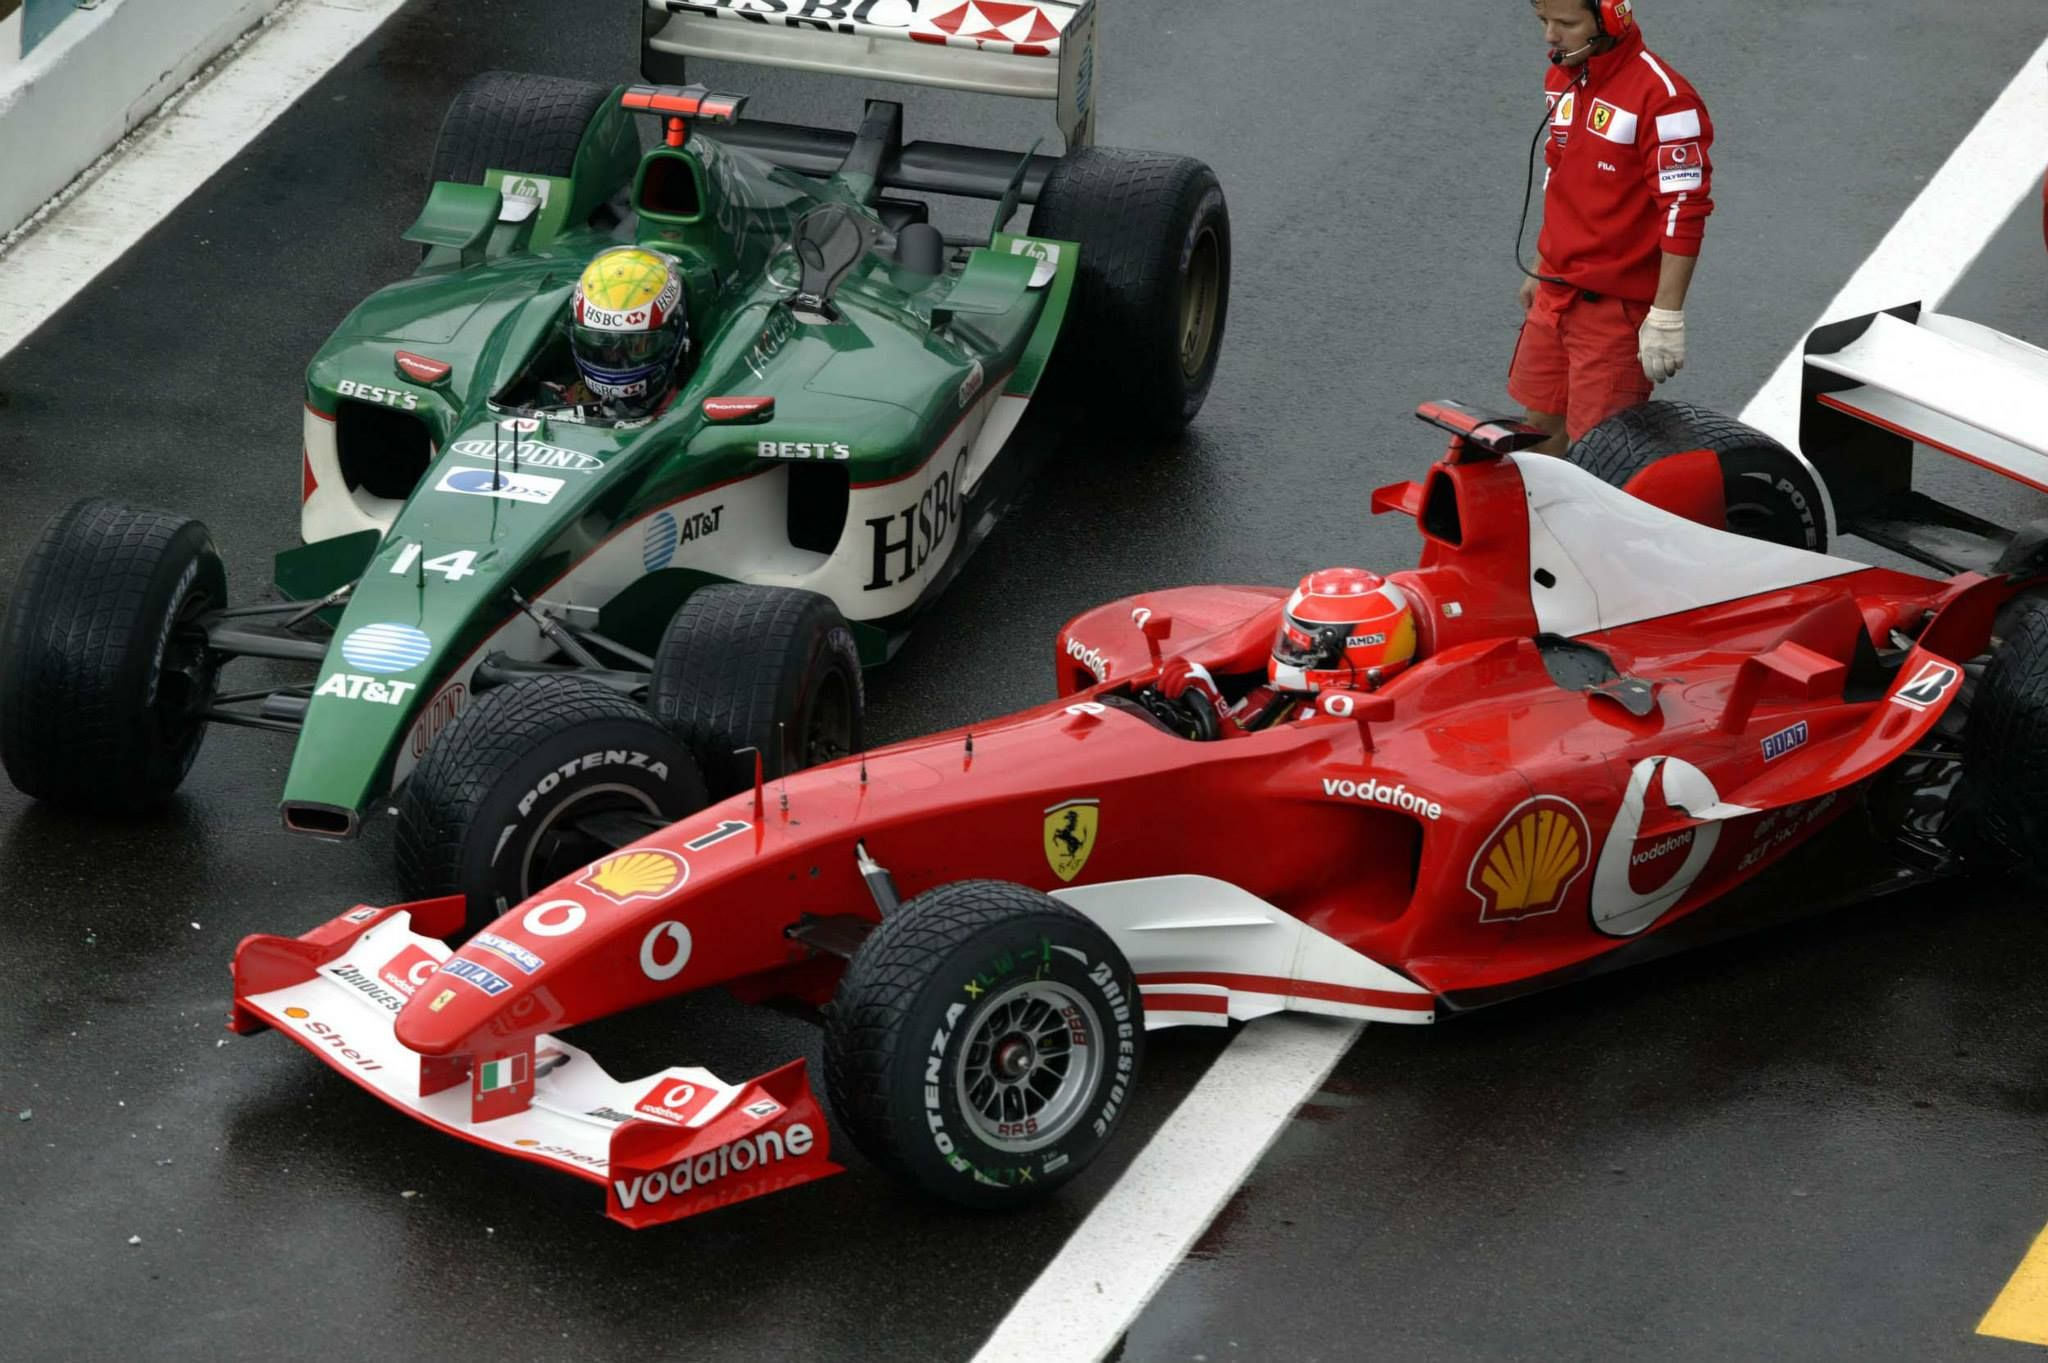 Michael Schumacher Mark Webber Pit Collision Ferrari F2003 Ga